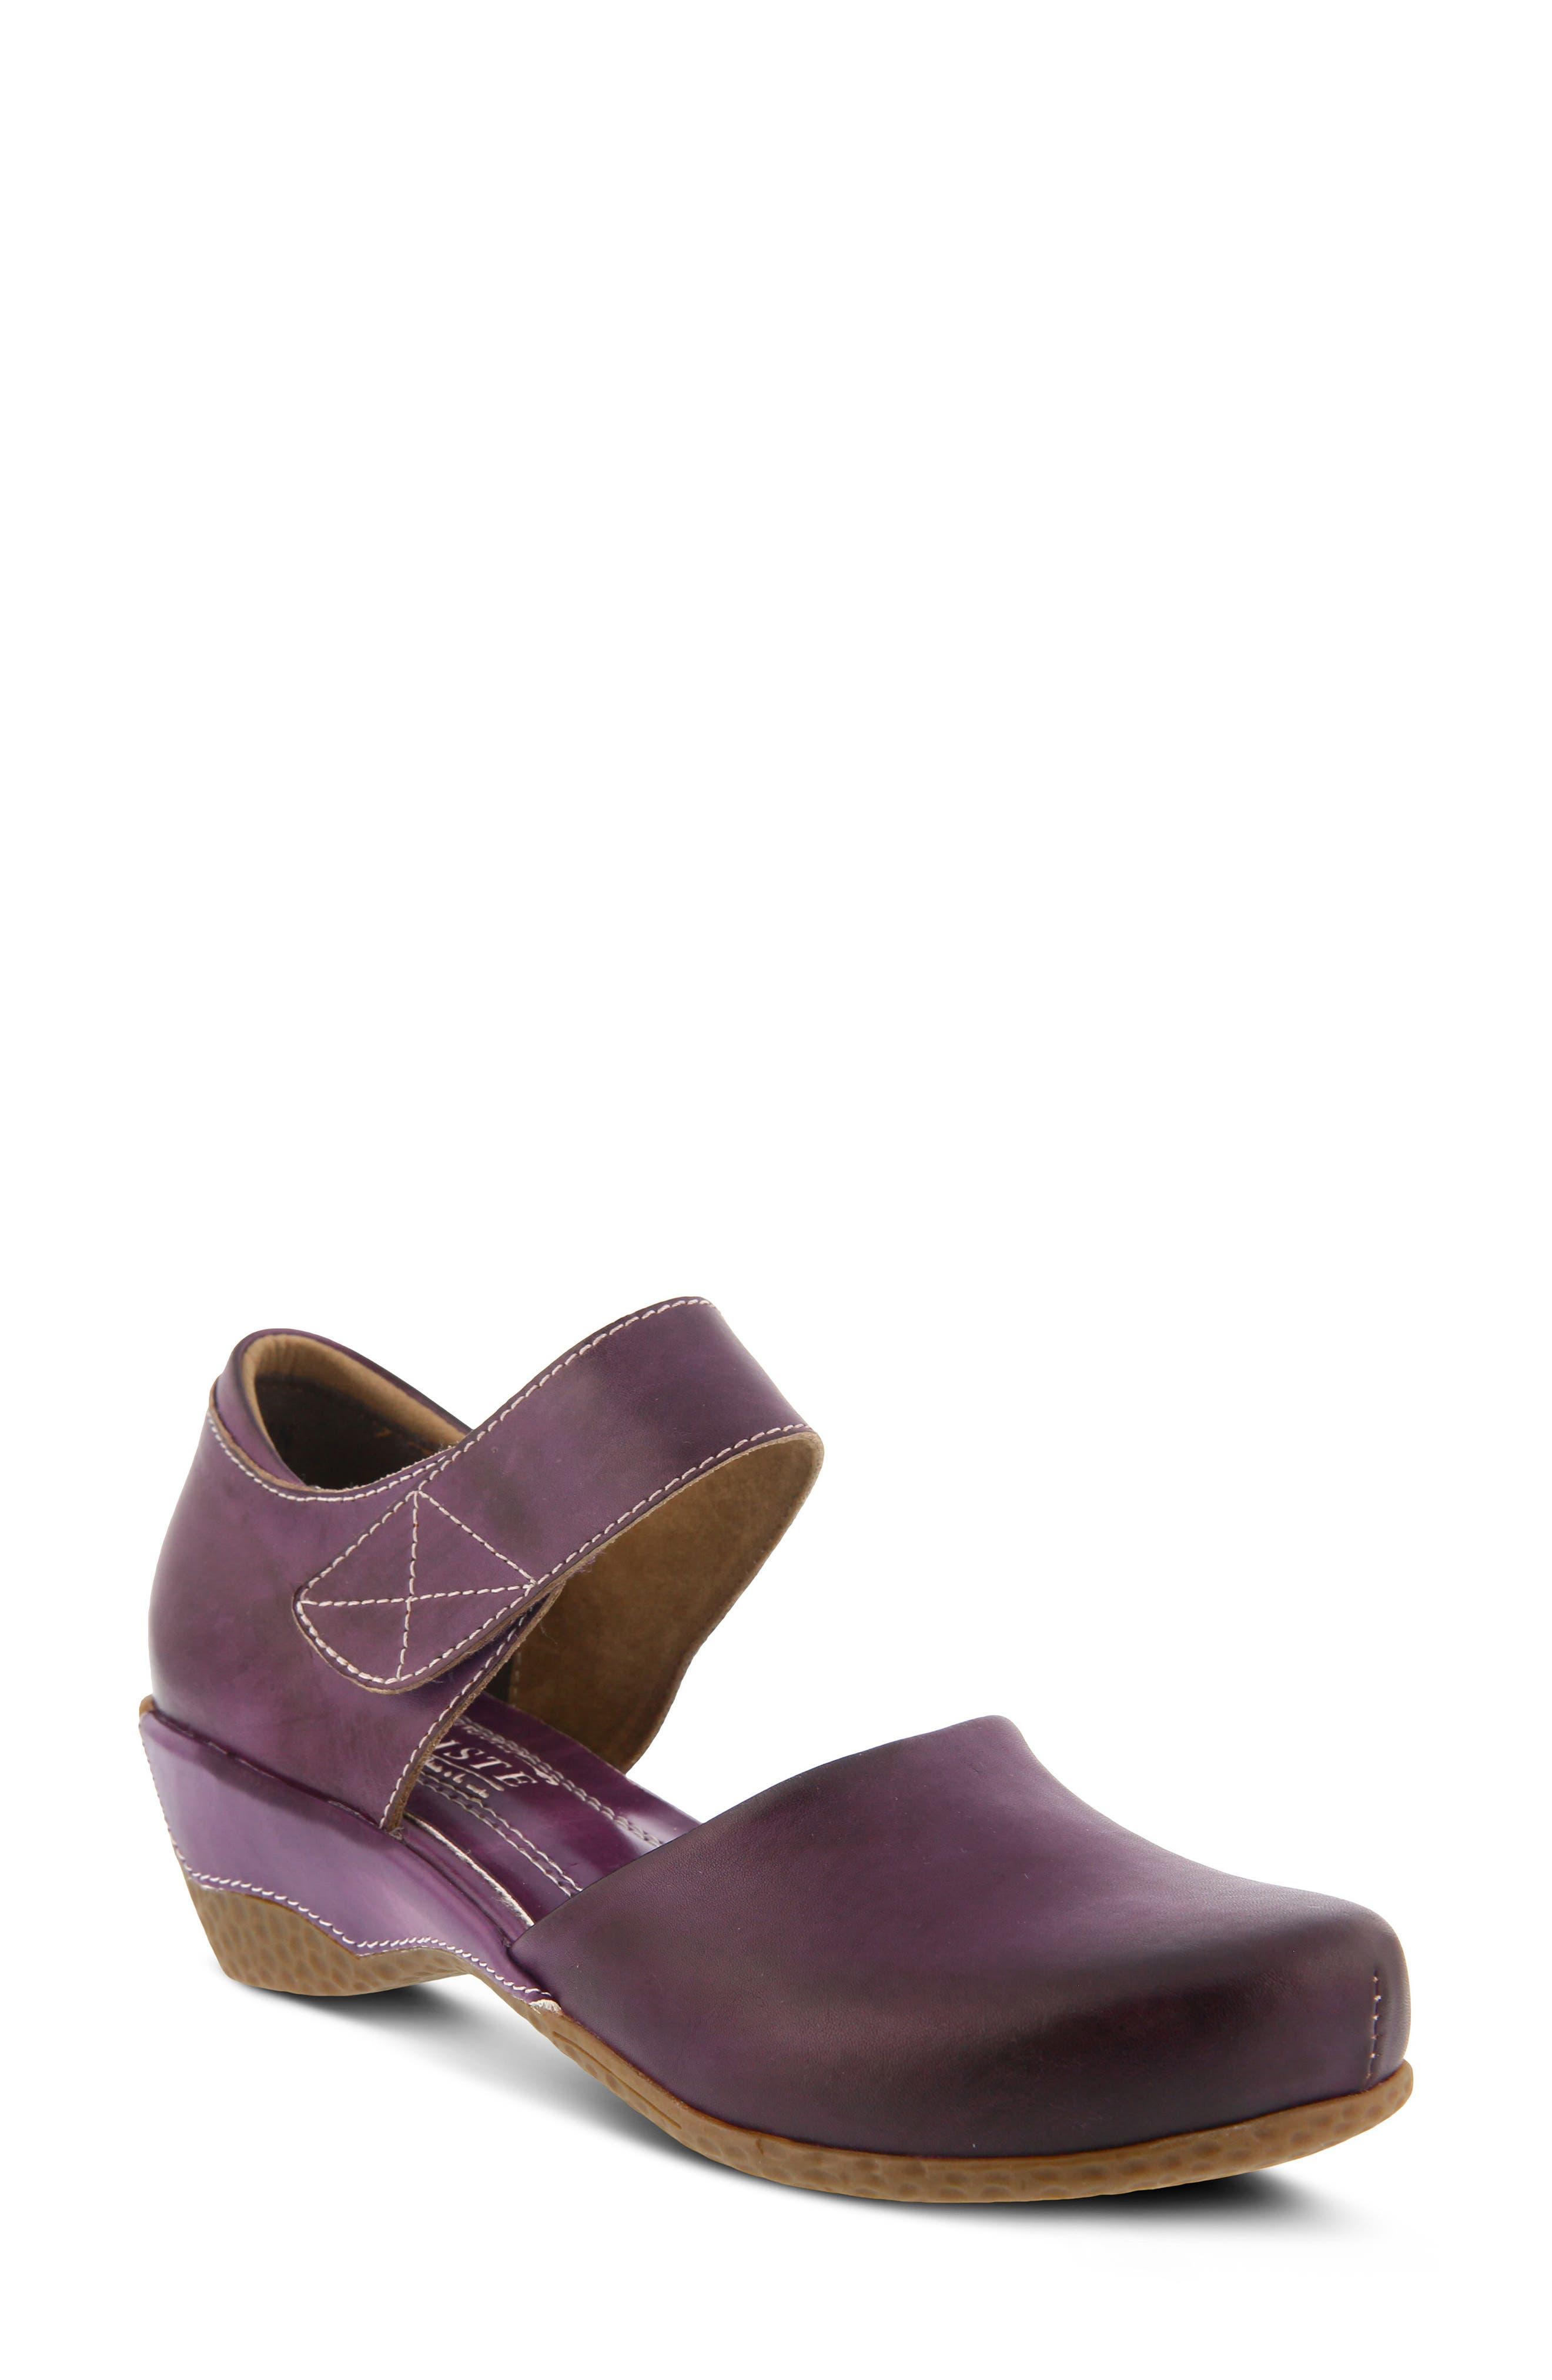 L'Artiste Gloss Mary Jane Pump,                         Main,                         color, Purple Leather